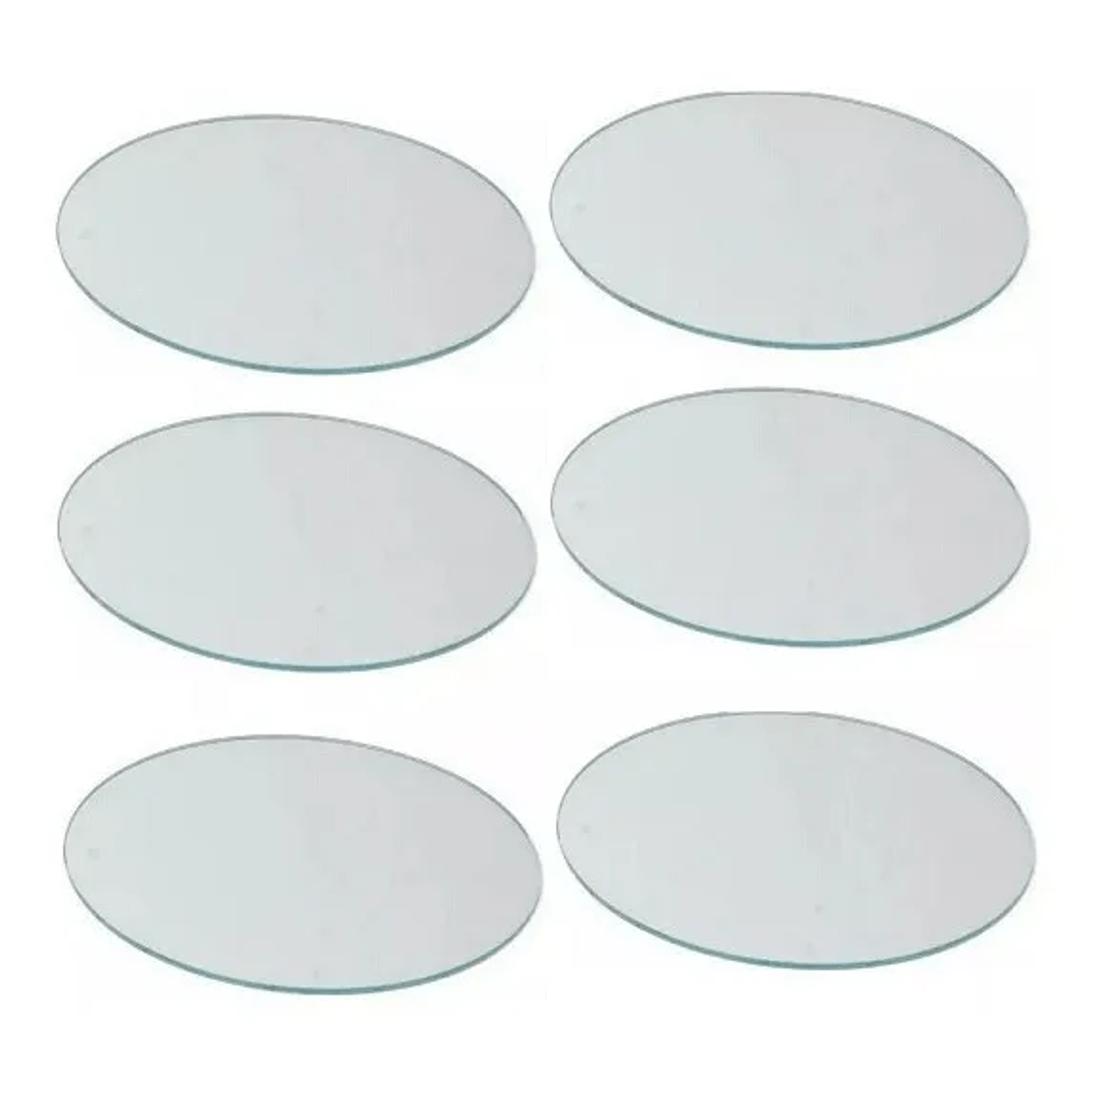 Kit-6-Espelho-Souplast-Liso-2mm-30cm-Redondo-Artesanato